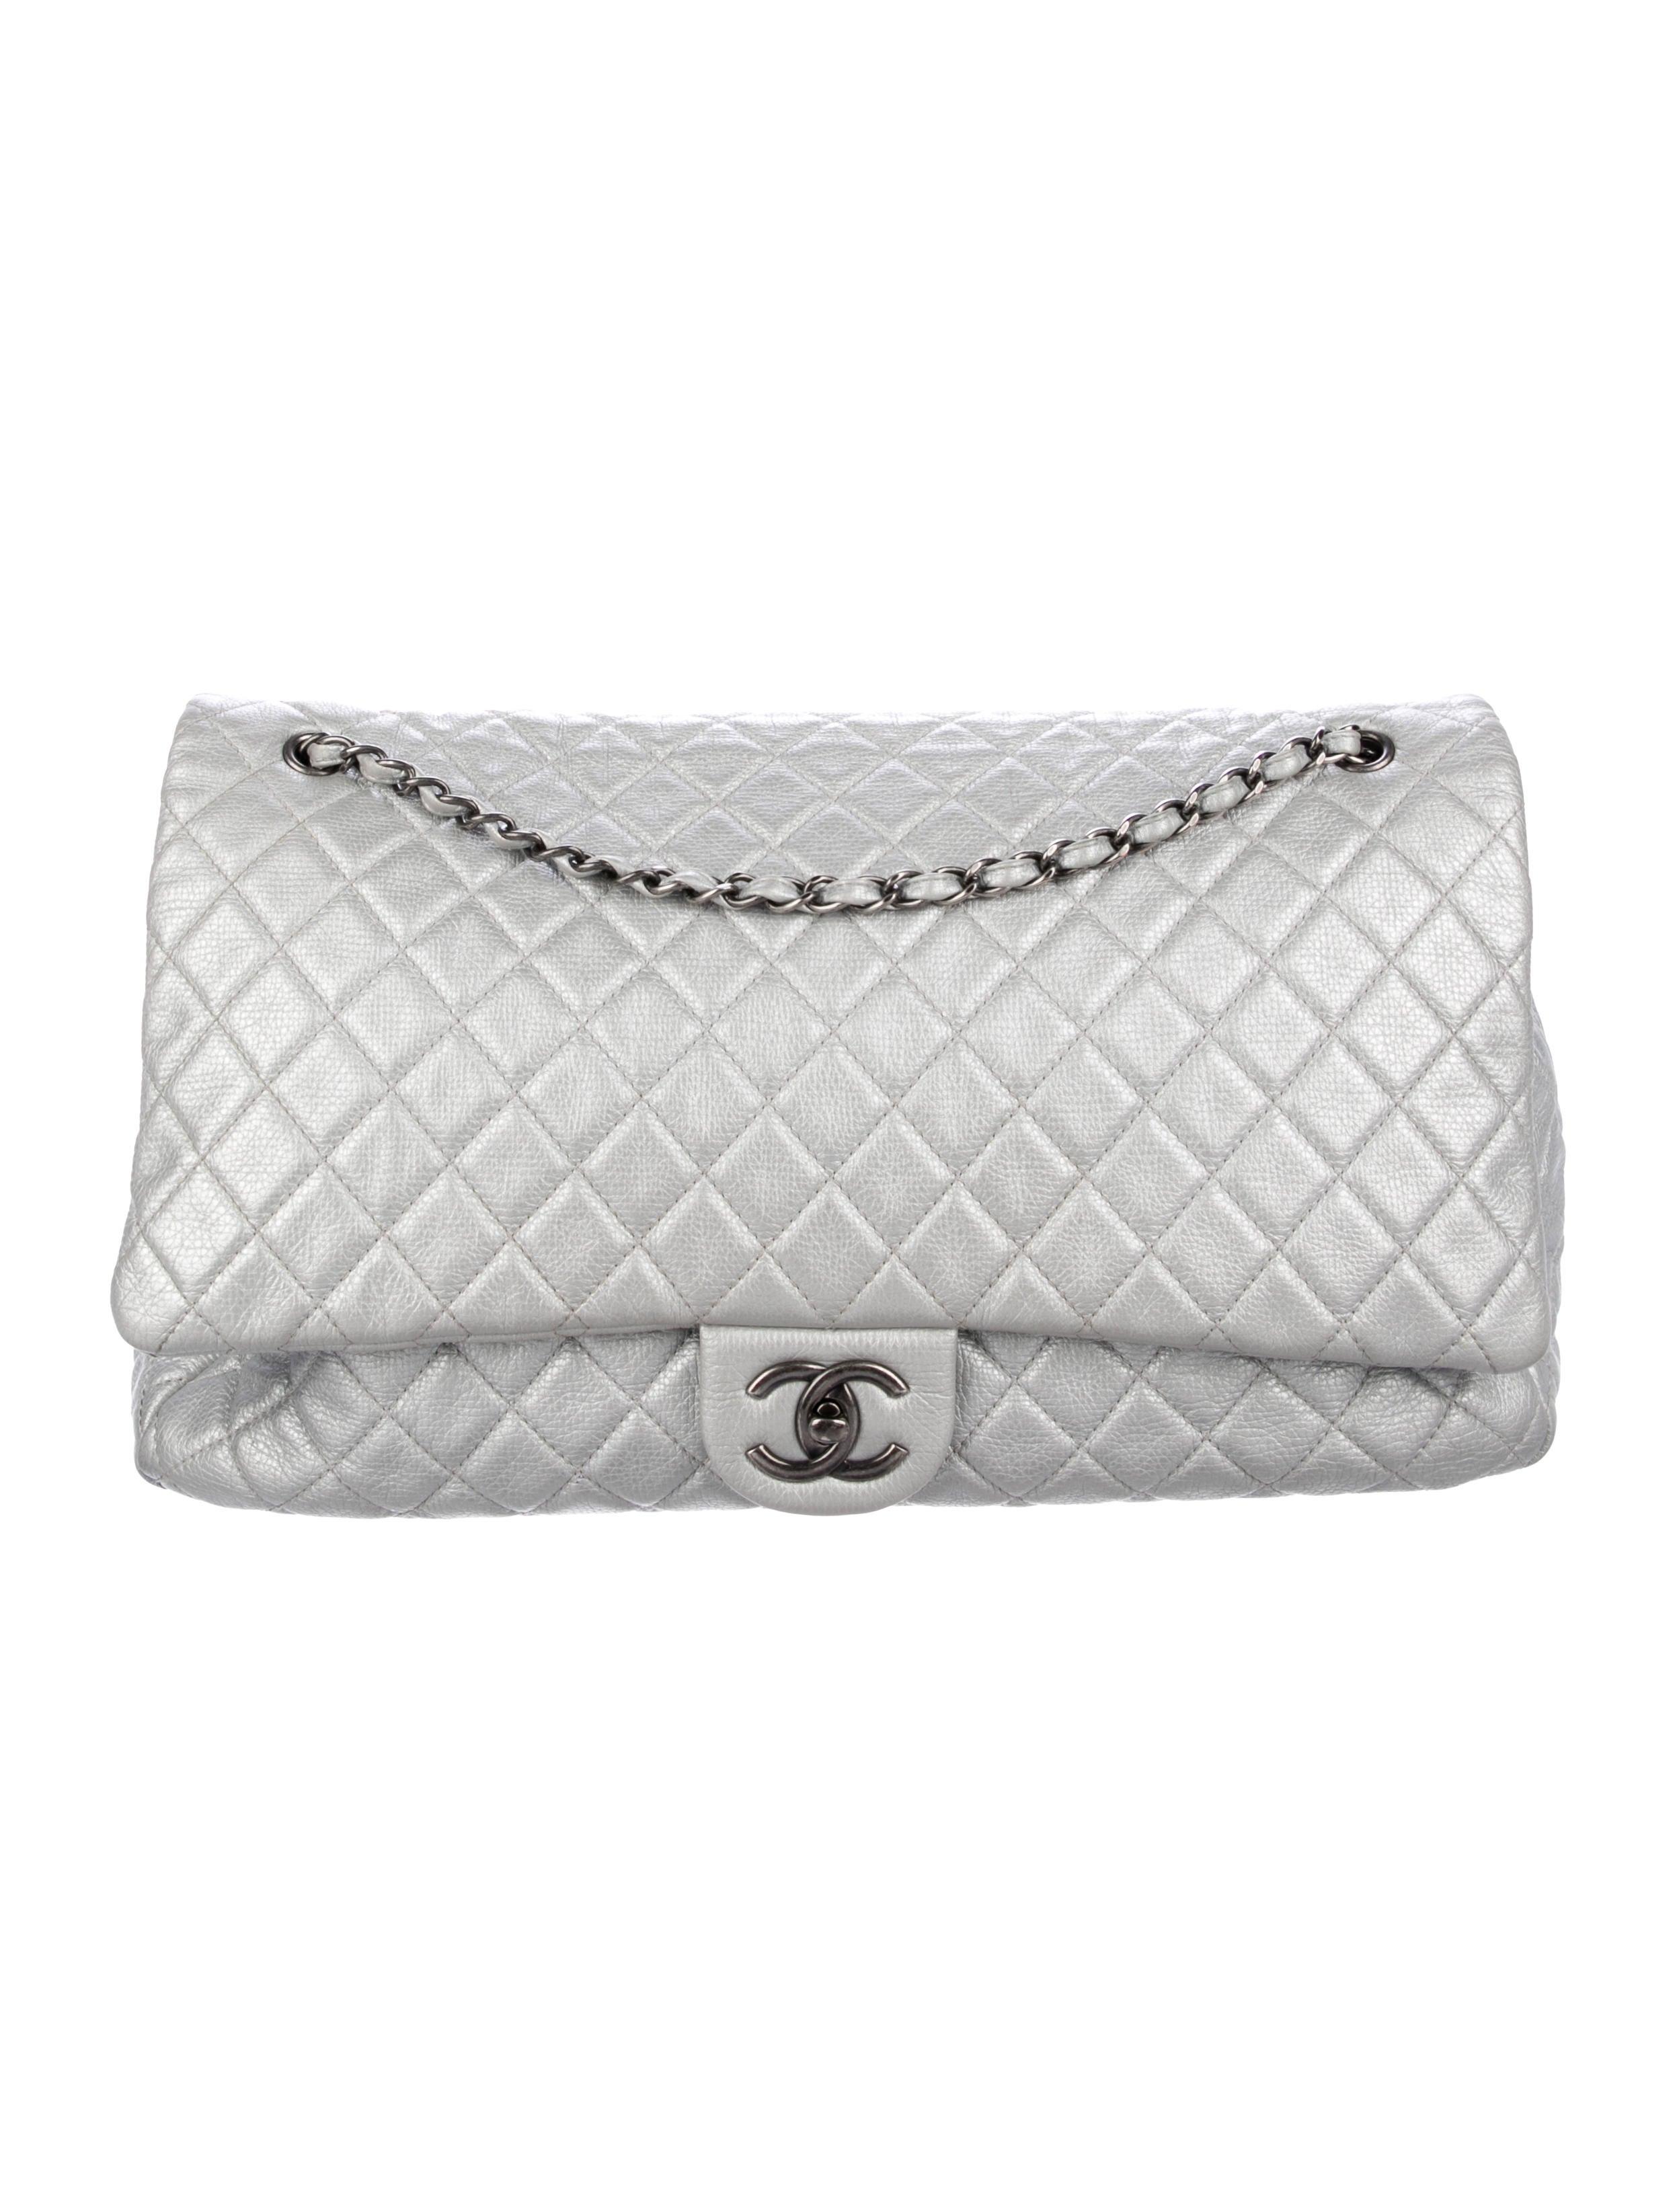 0f4b8f69732b Chanel XXL Airline Classic Flap Bag - Handbags - CHA316563 | The ...